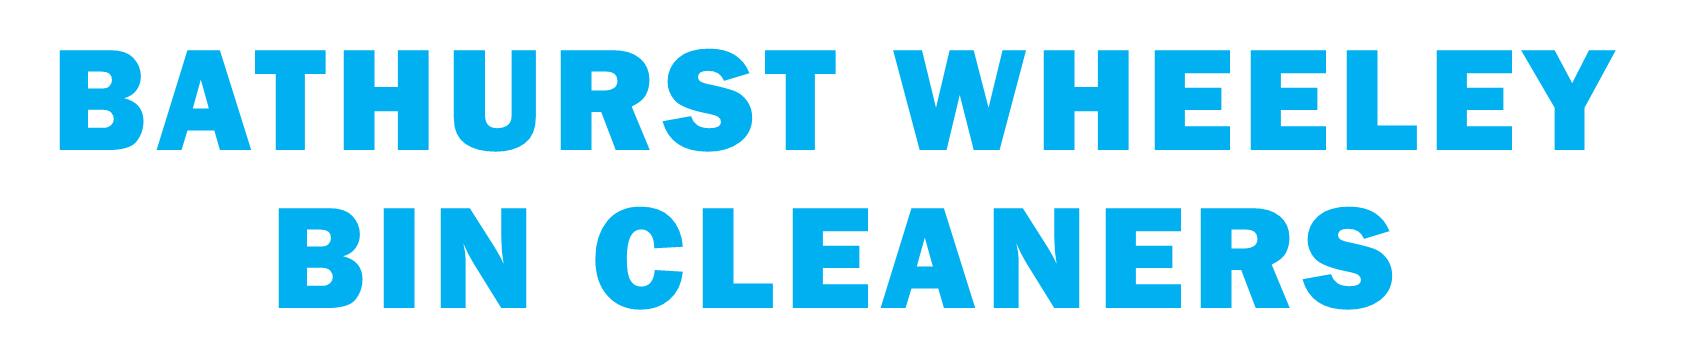 Bathurst Wheeley Bin Cleaners